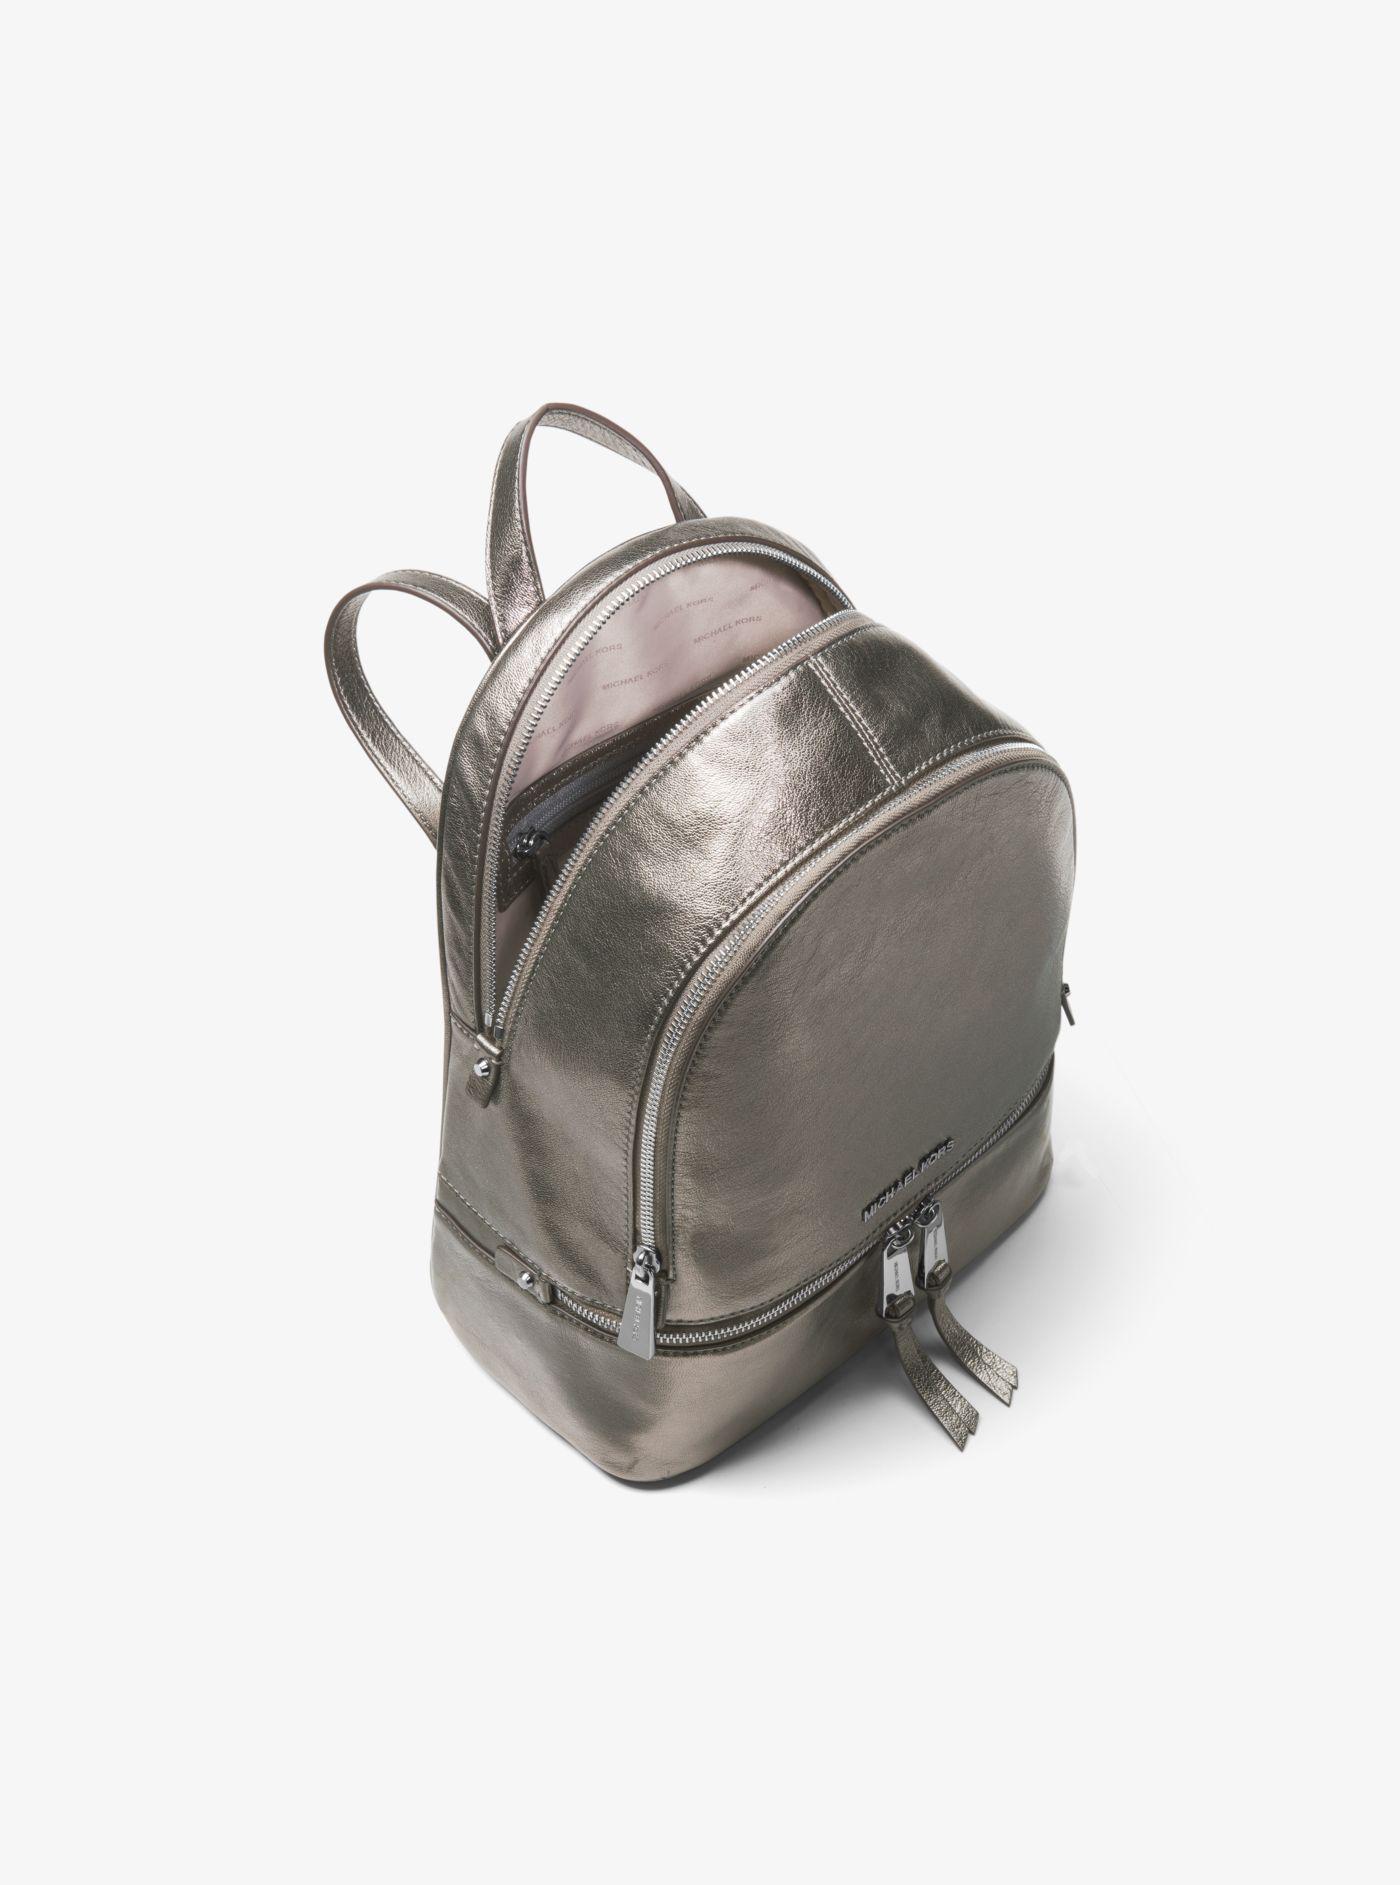 d0dec8f5094b Michael Kors Rhea Medium Metallic Leather Backpack - Lyst